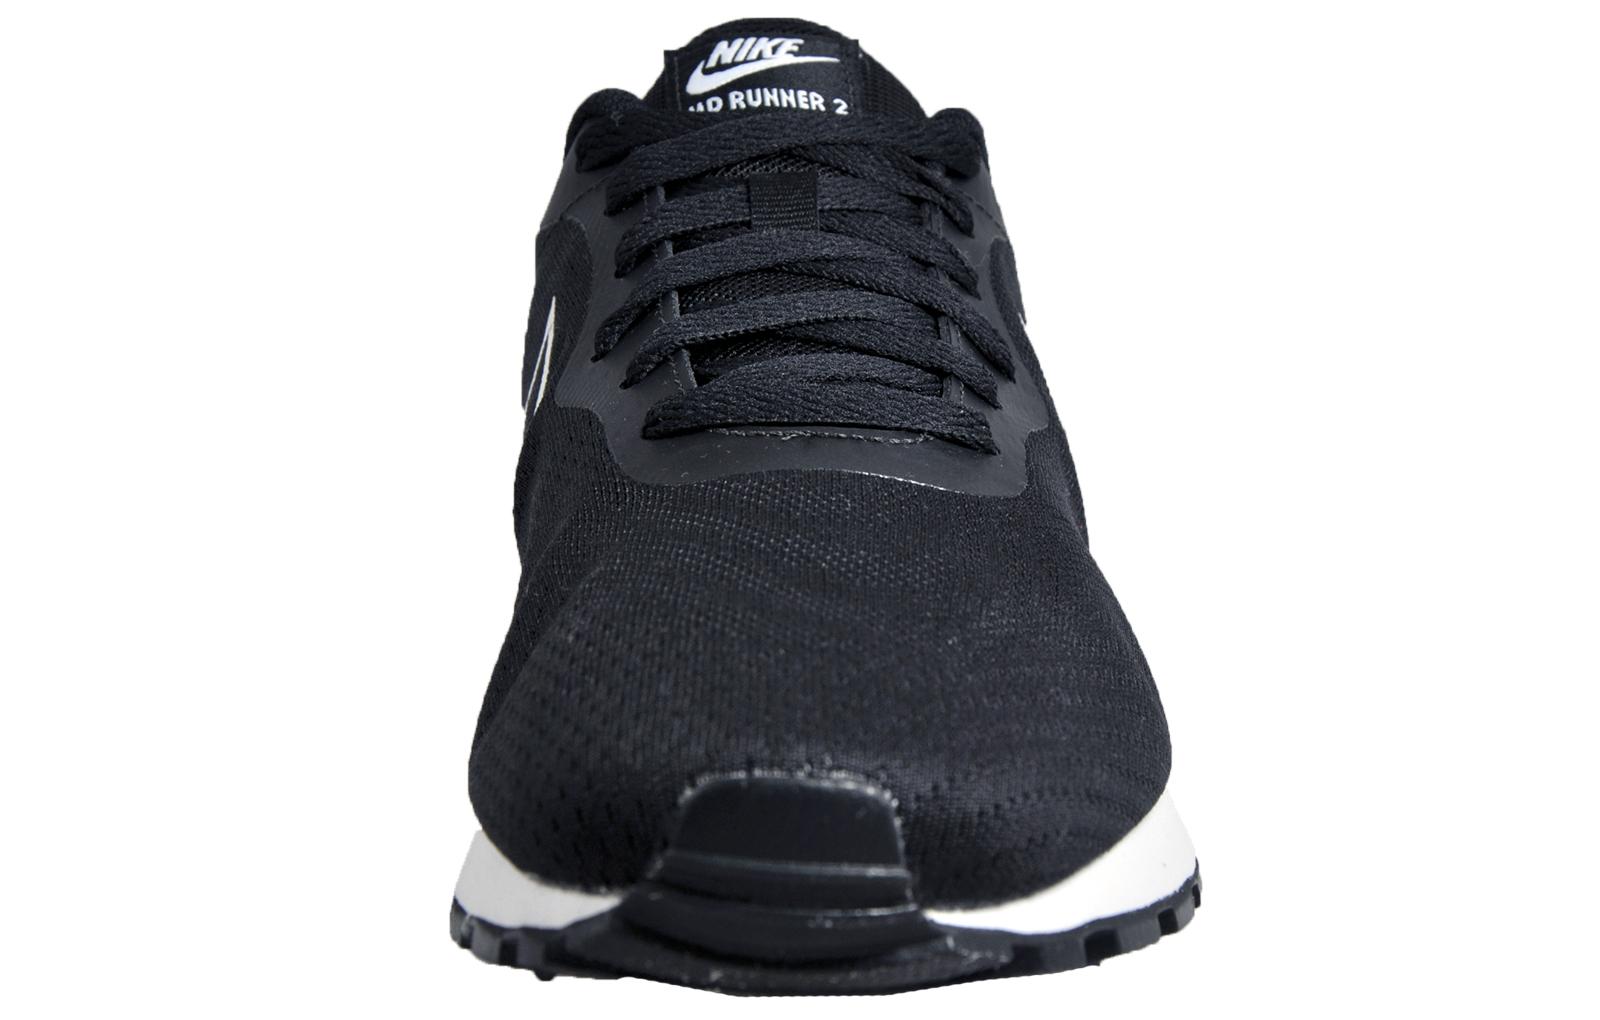 ffde9da59e Nike MD Runner 2 Eng Mesh Mens Classic Casual Retro Trainers Black ...